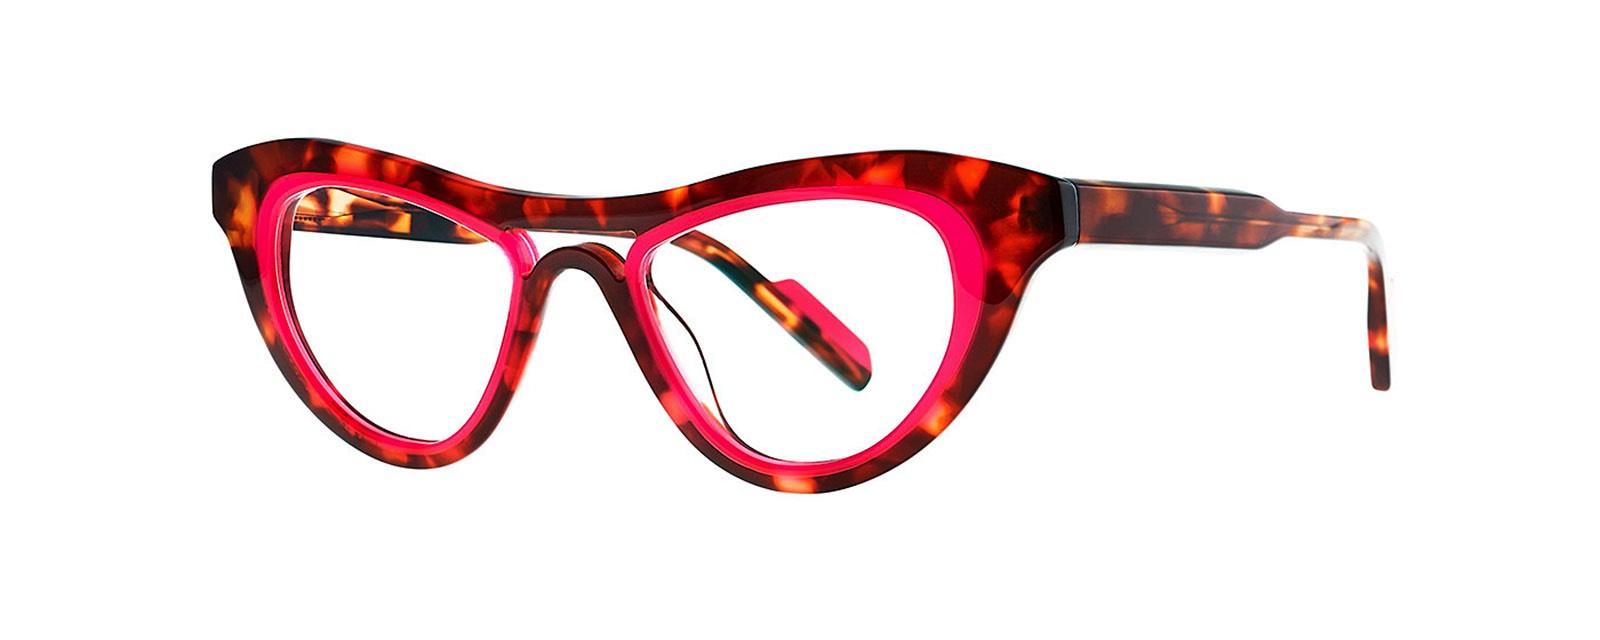 6f8f1e6ad91 Theo-brillen-en-zonnebrillen-desserts-mille-feuille-006-havanafluo-pink